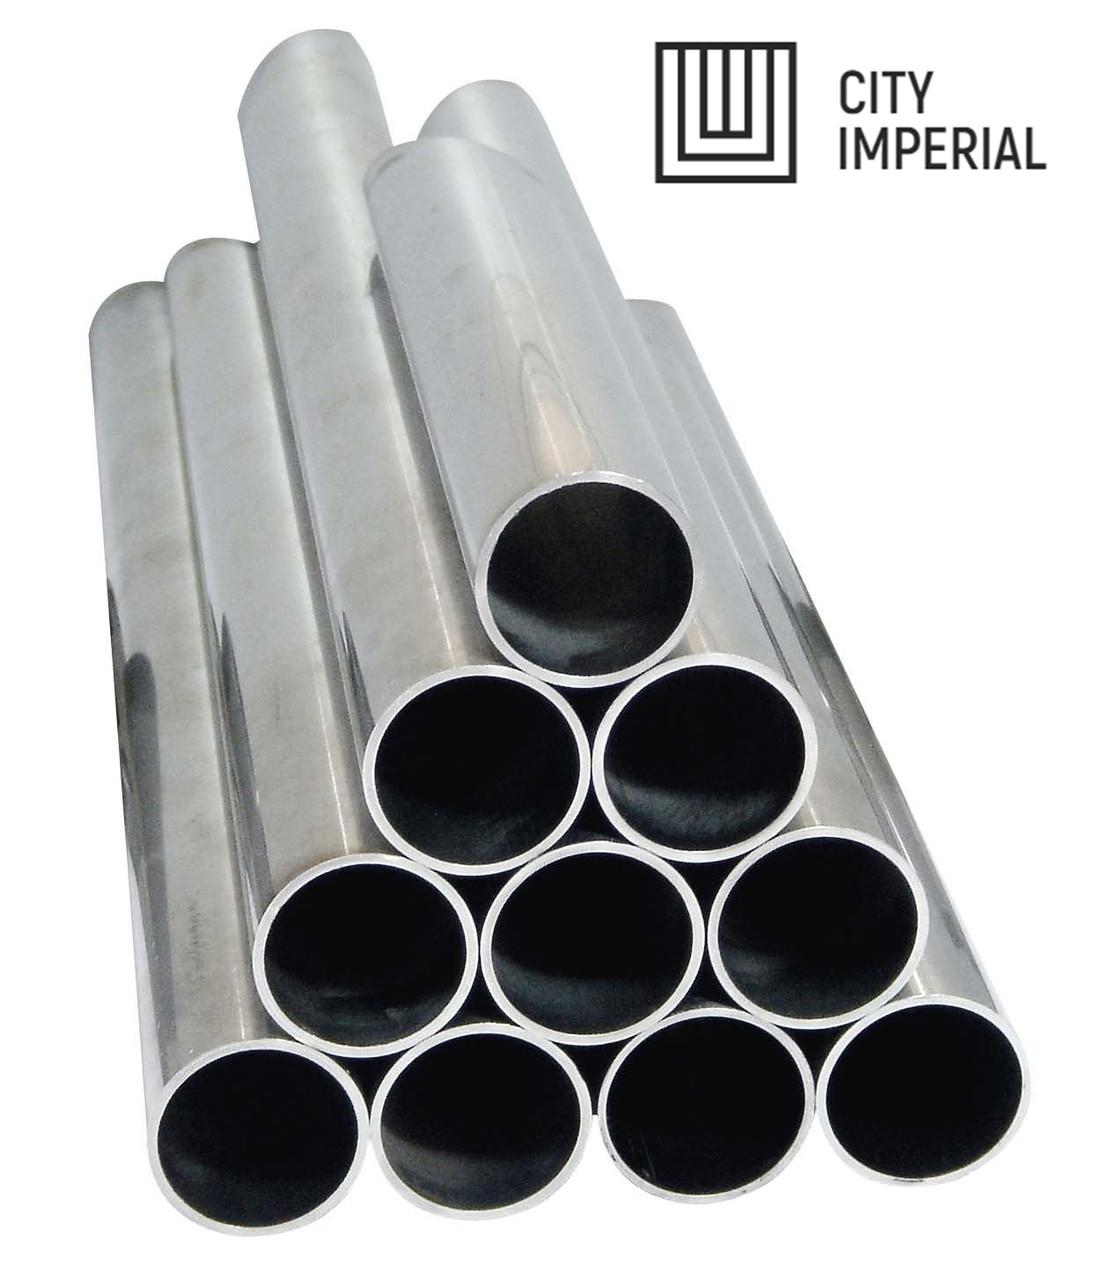 Труба 485 х 40 сталь 40ХН2МА